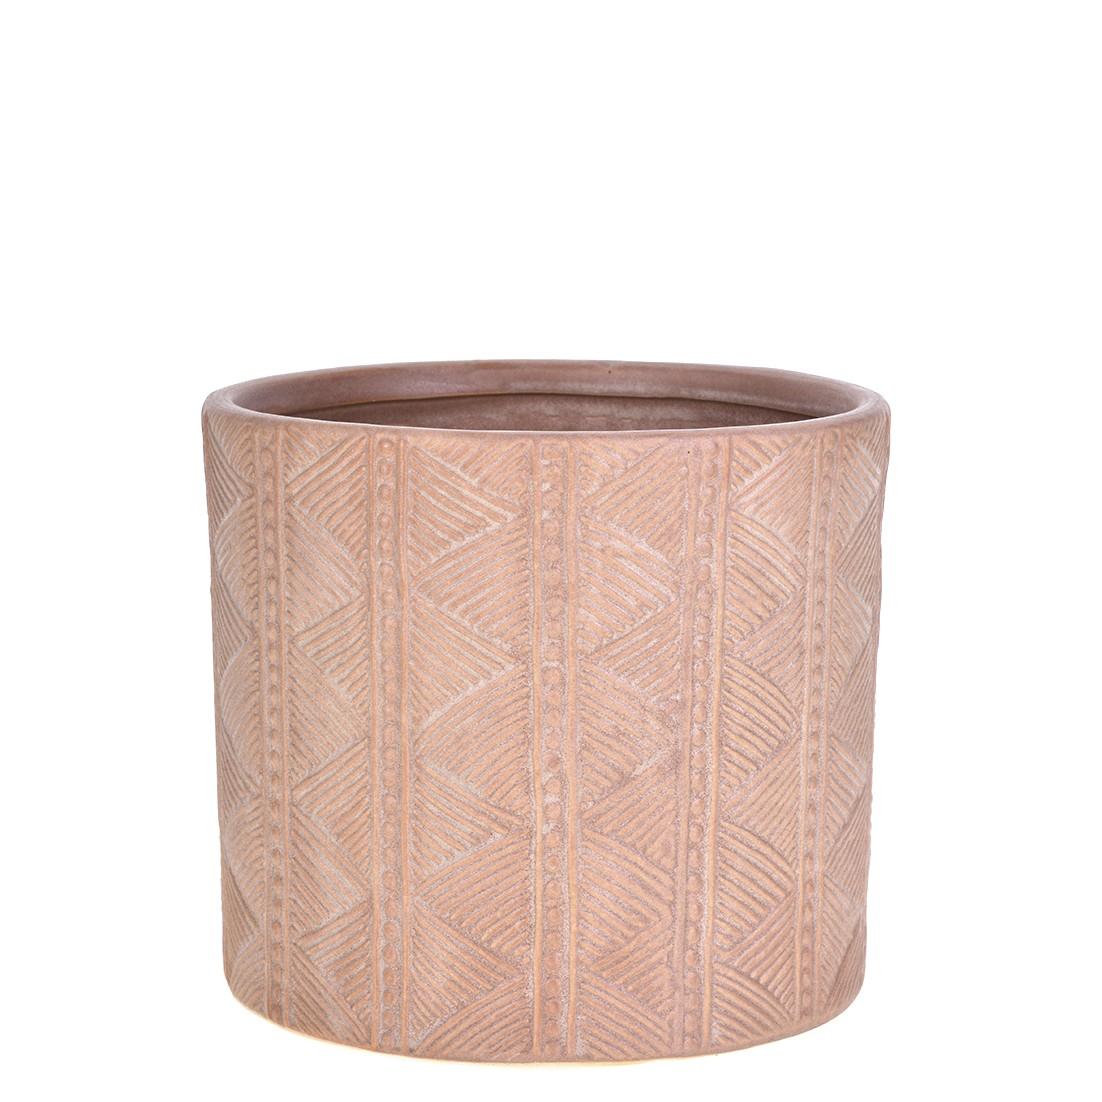 Vaso Decorativo de Ceramica Redondo Bali 15cm Terracota